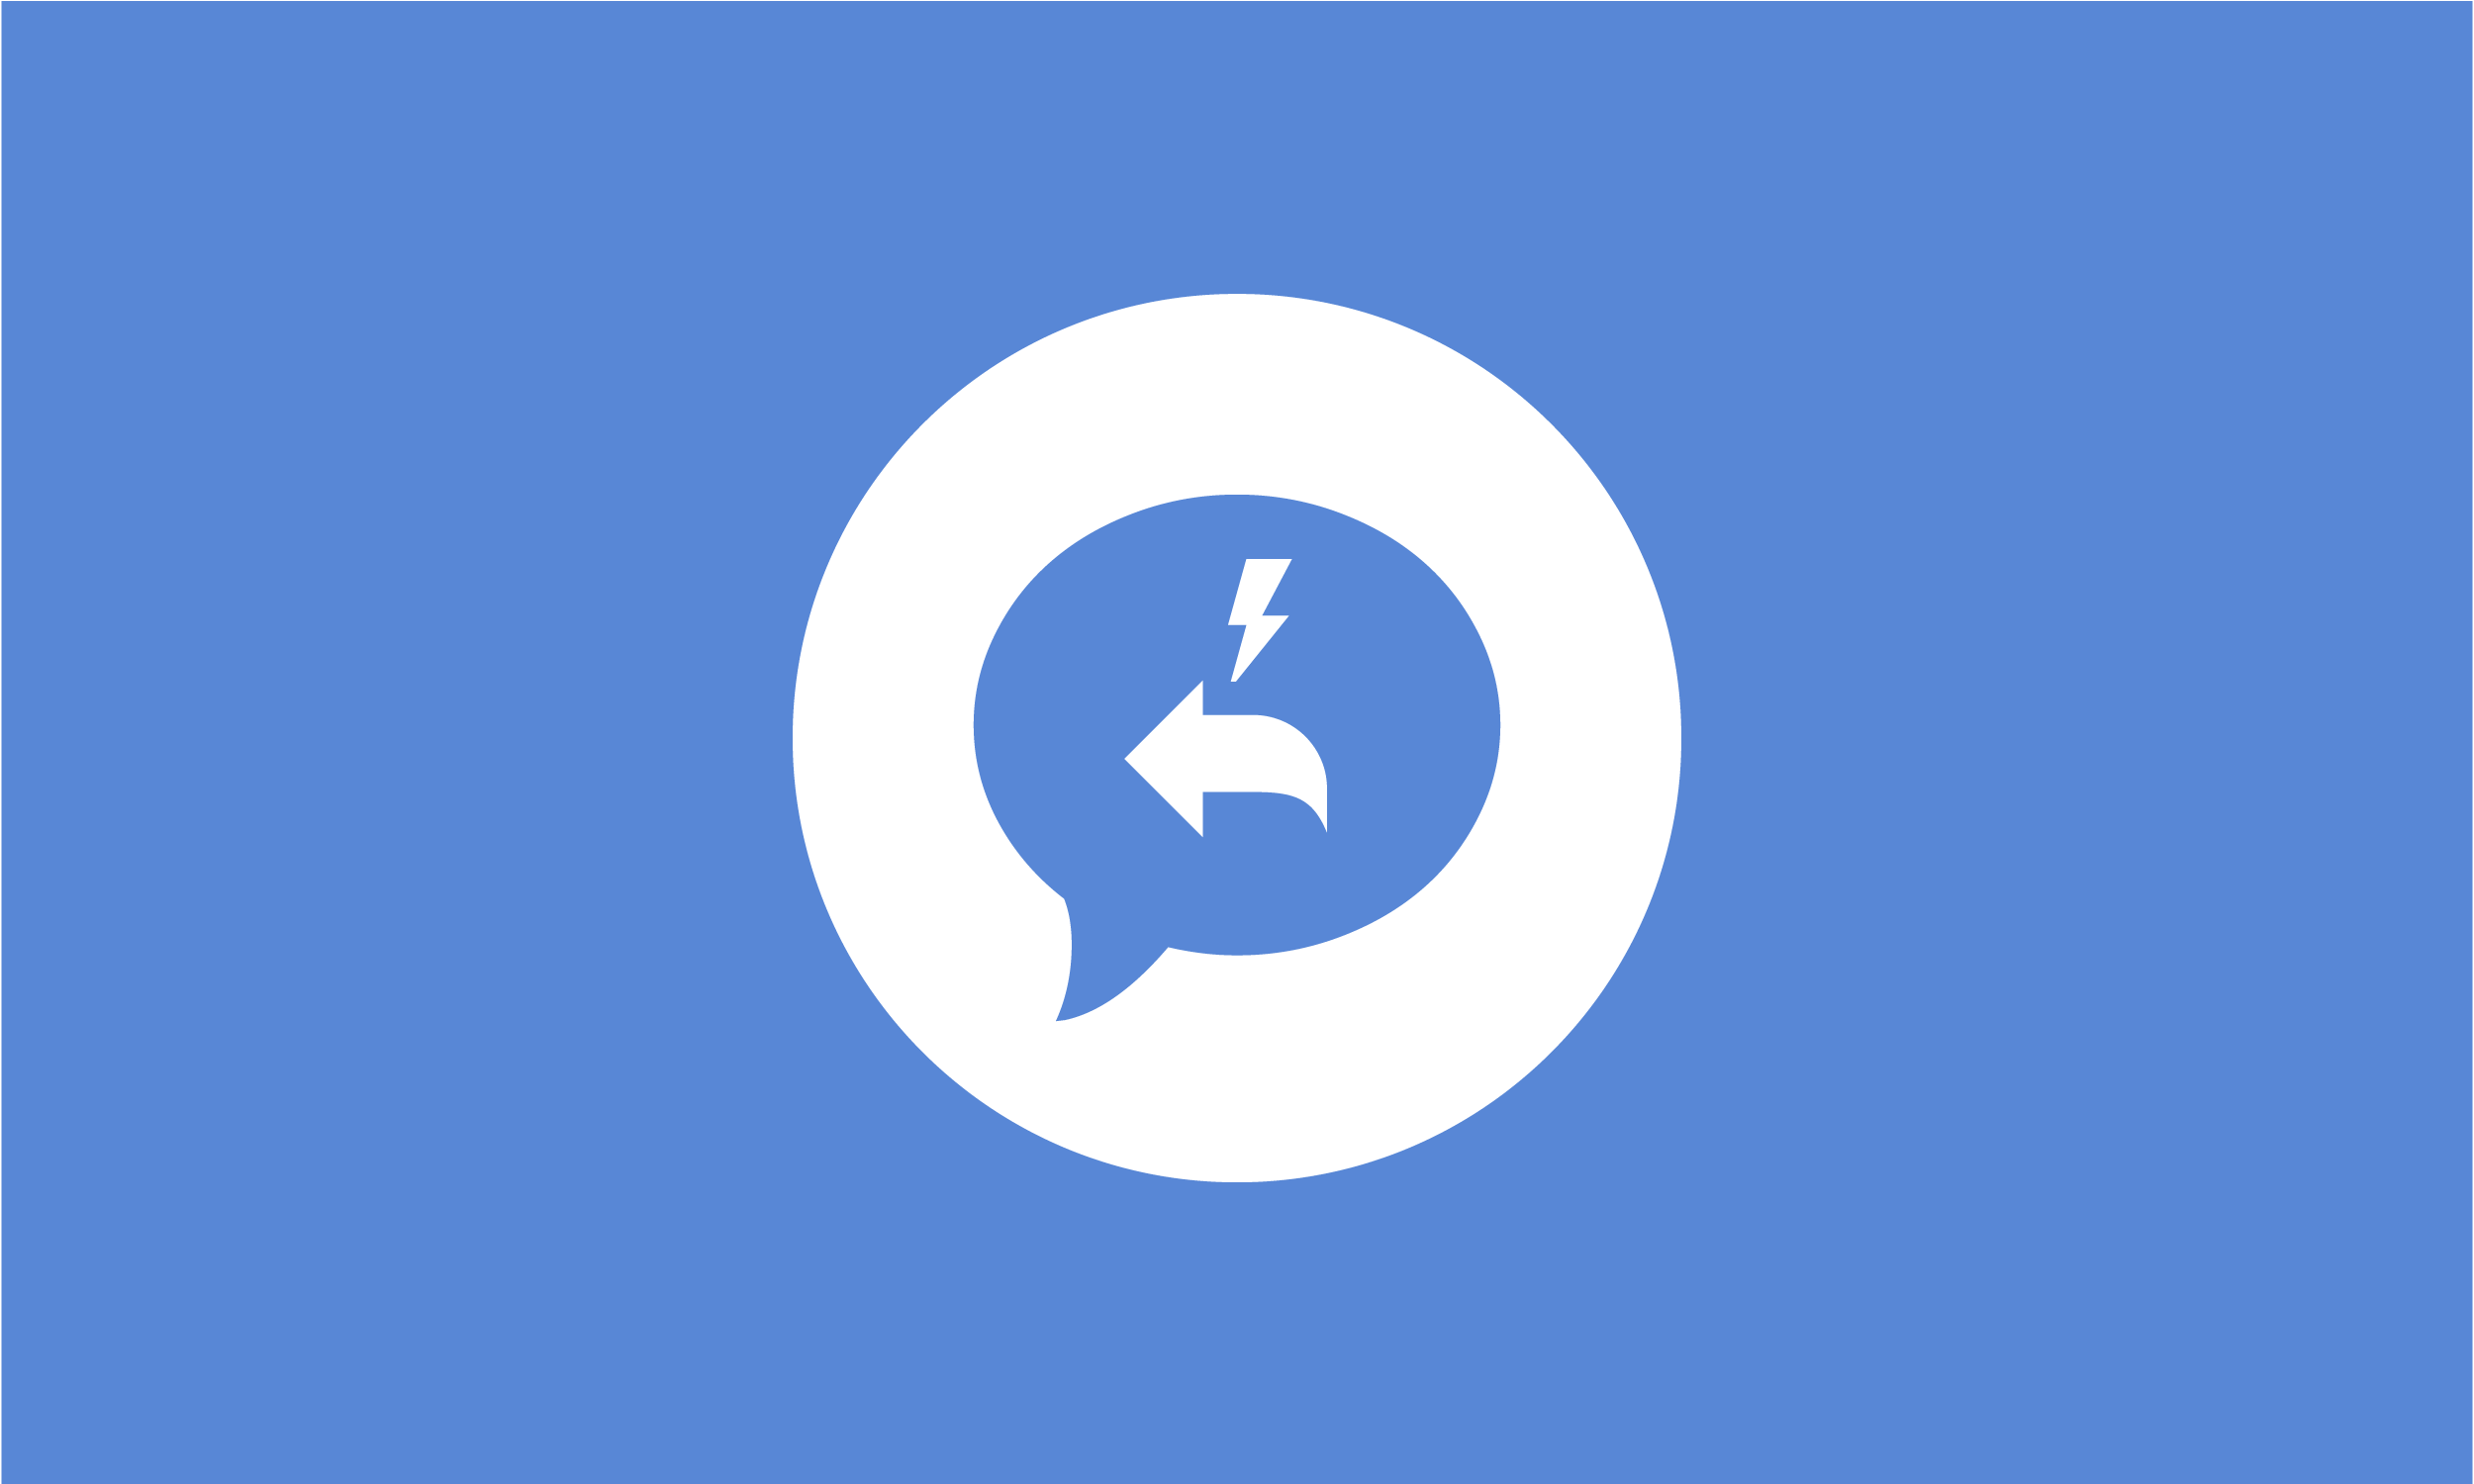 548317_RCS Features_Quick Replies_100319.png